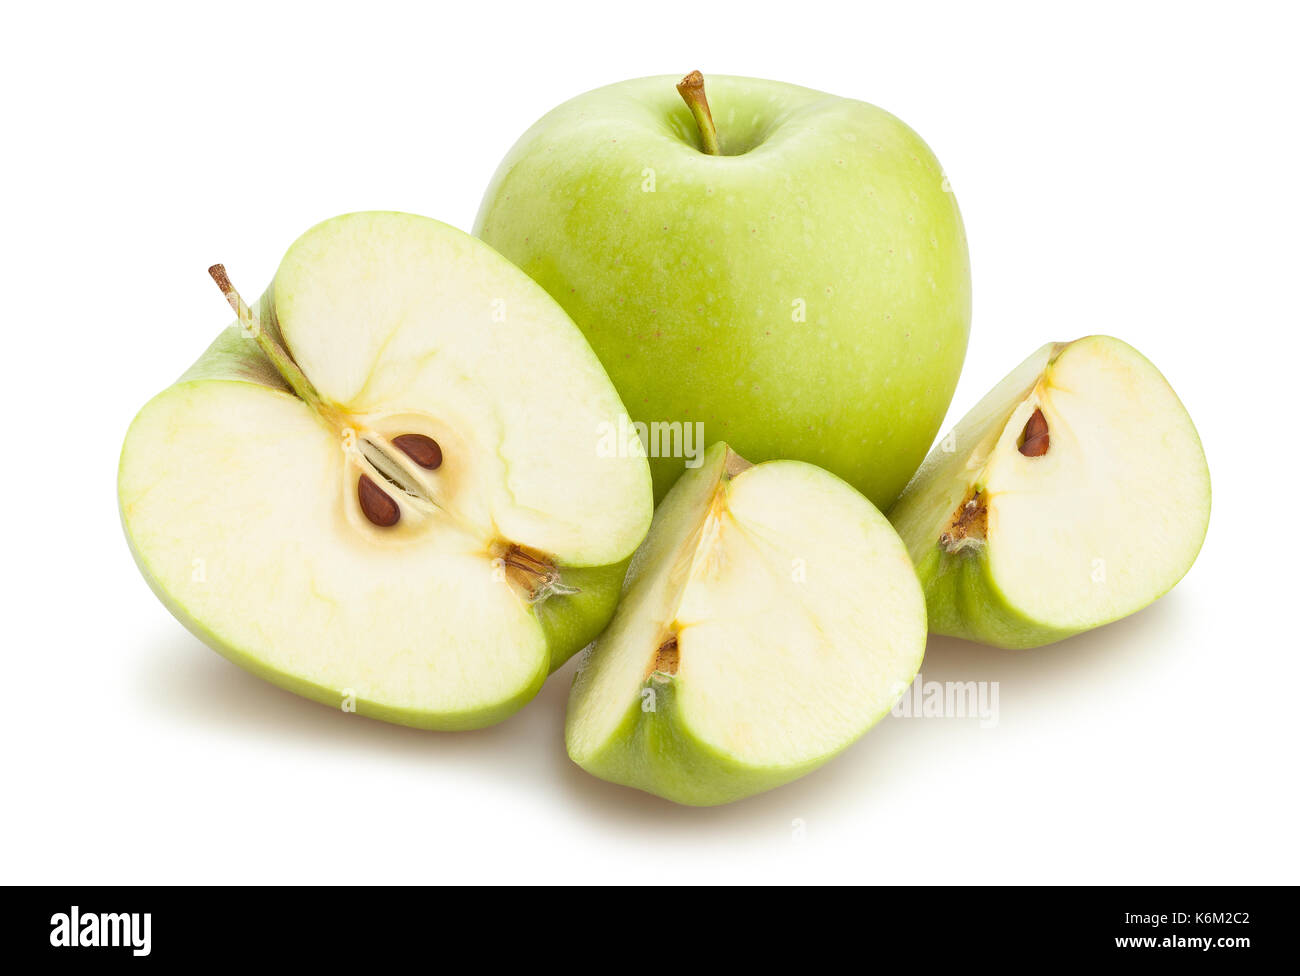 Tranches de pomme verte isolé chemin Photo Stock